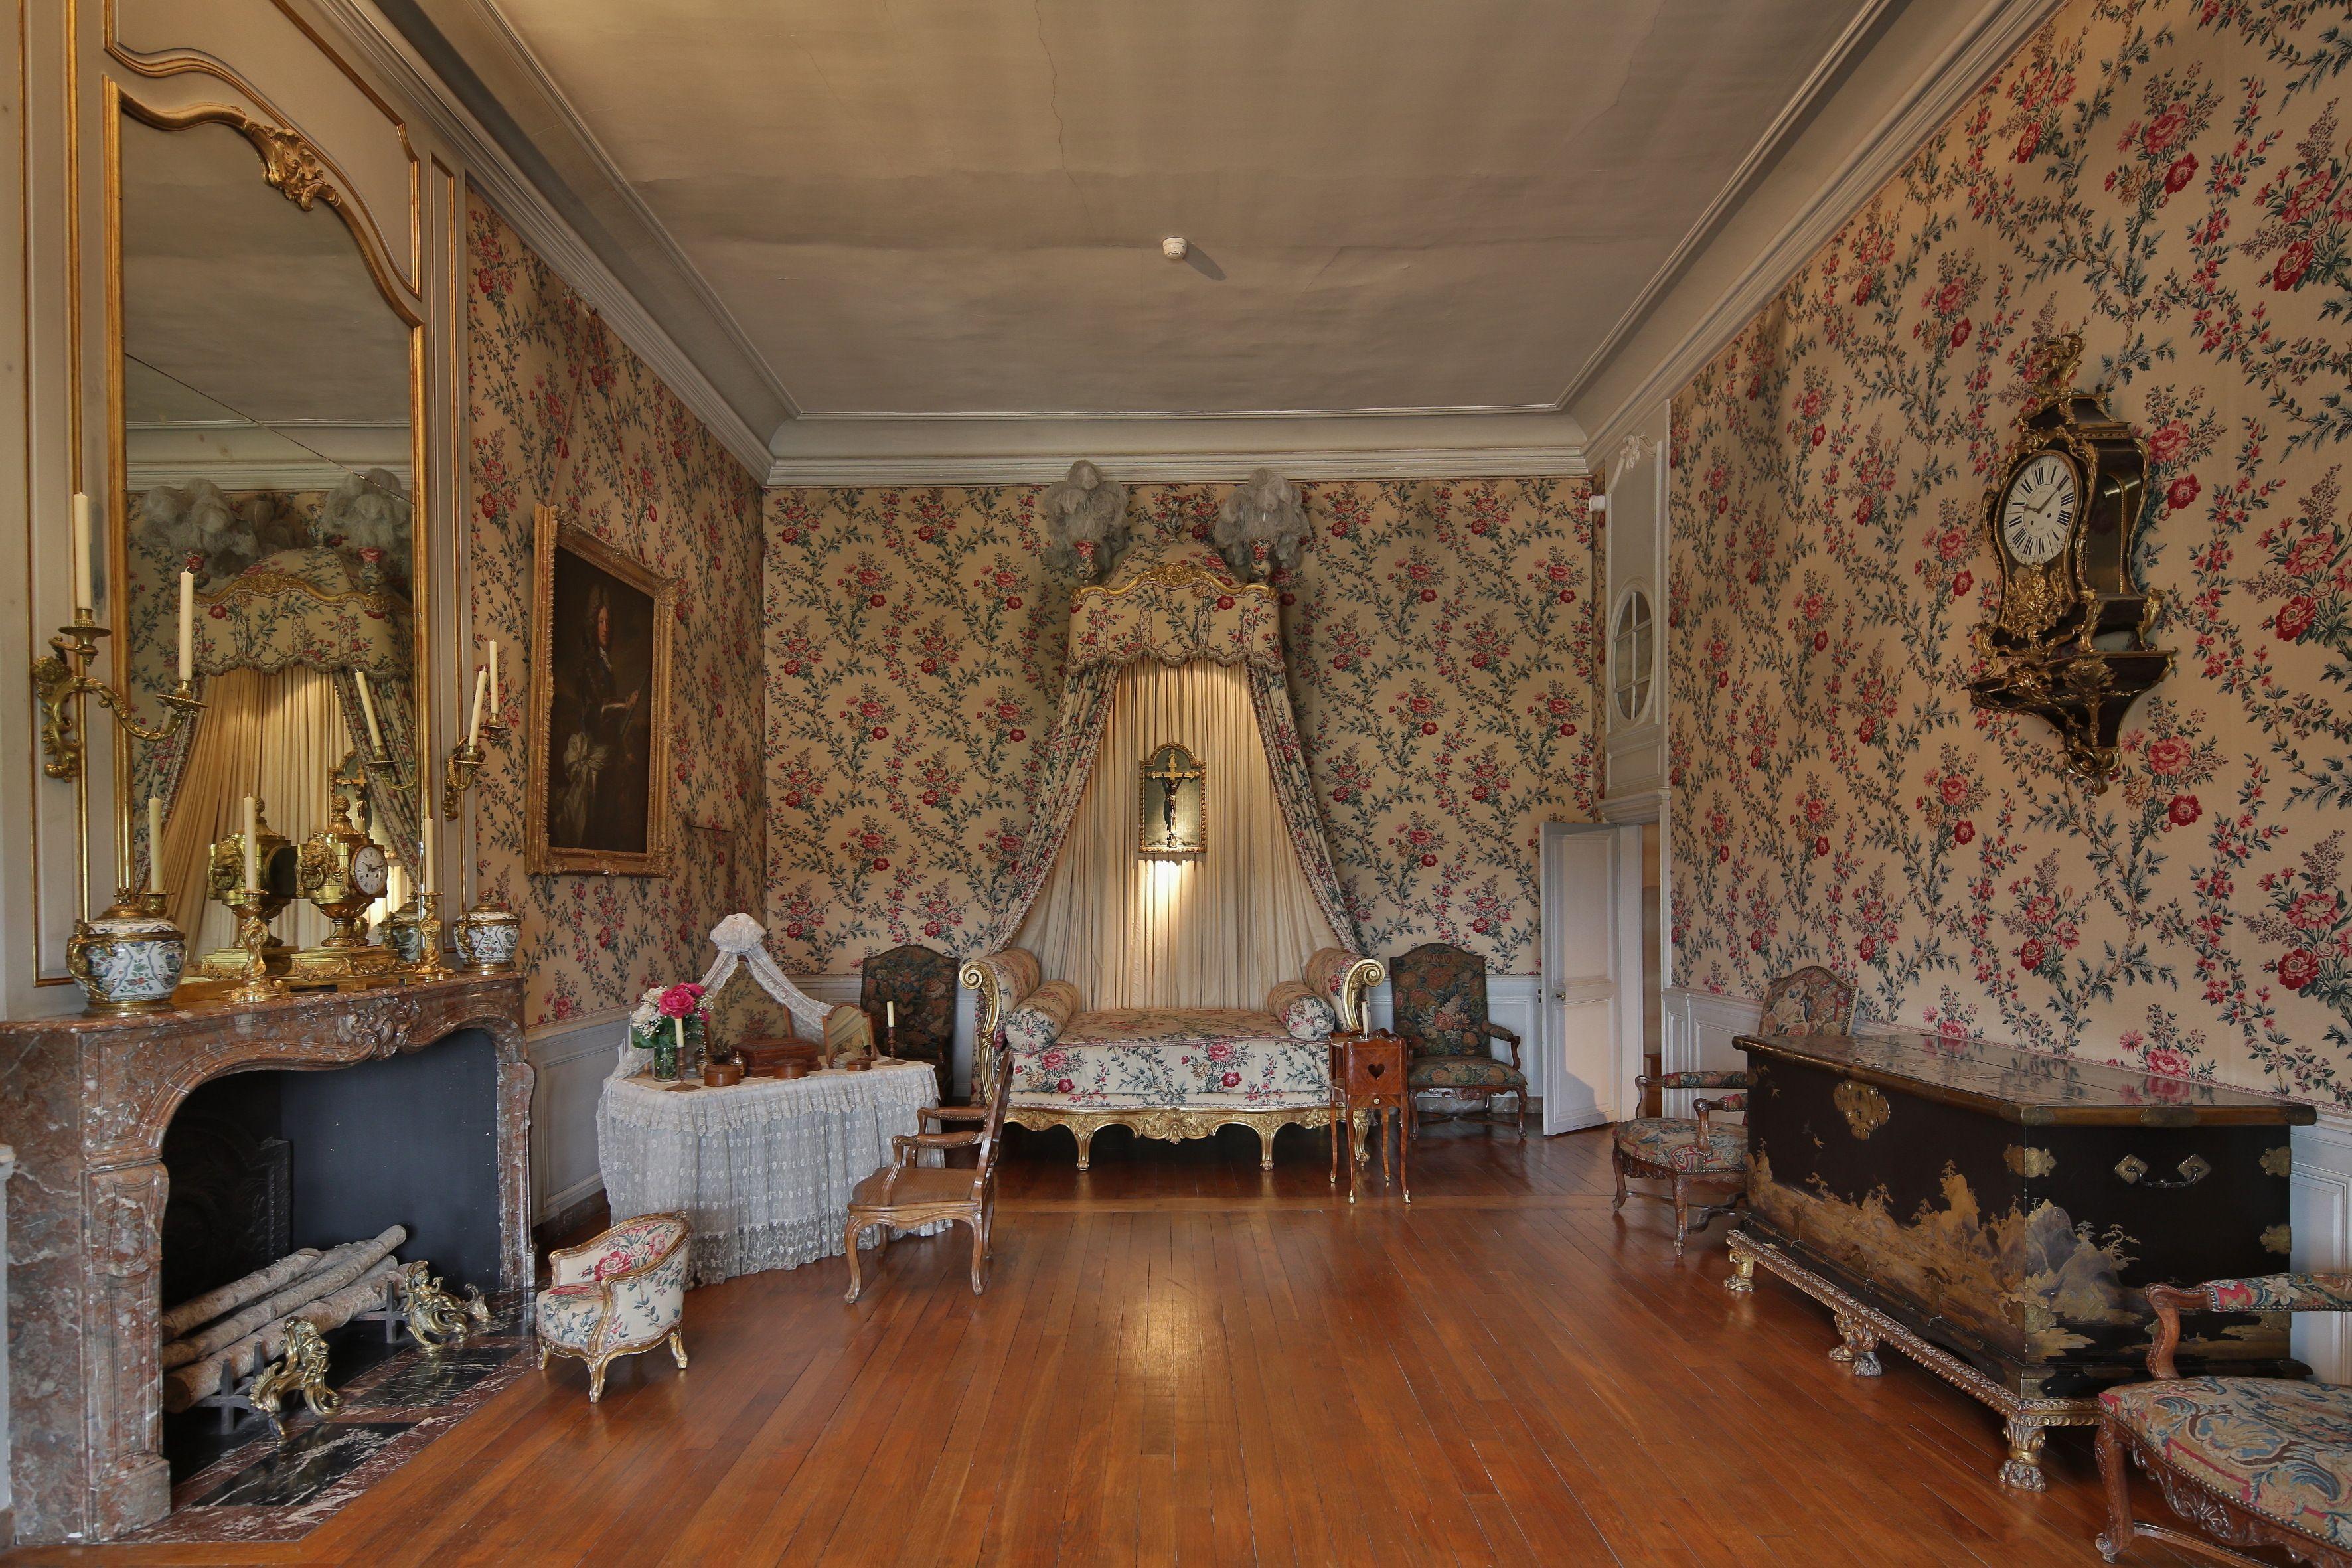 Vaux Le Vicomte La Chambre Louis Xv C Yann Piriou French Style Furniture Old World Bedroom Chateau France